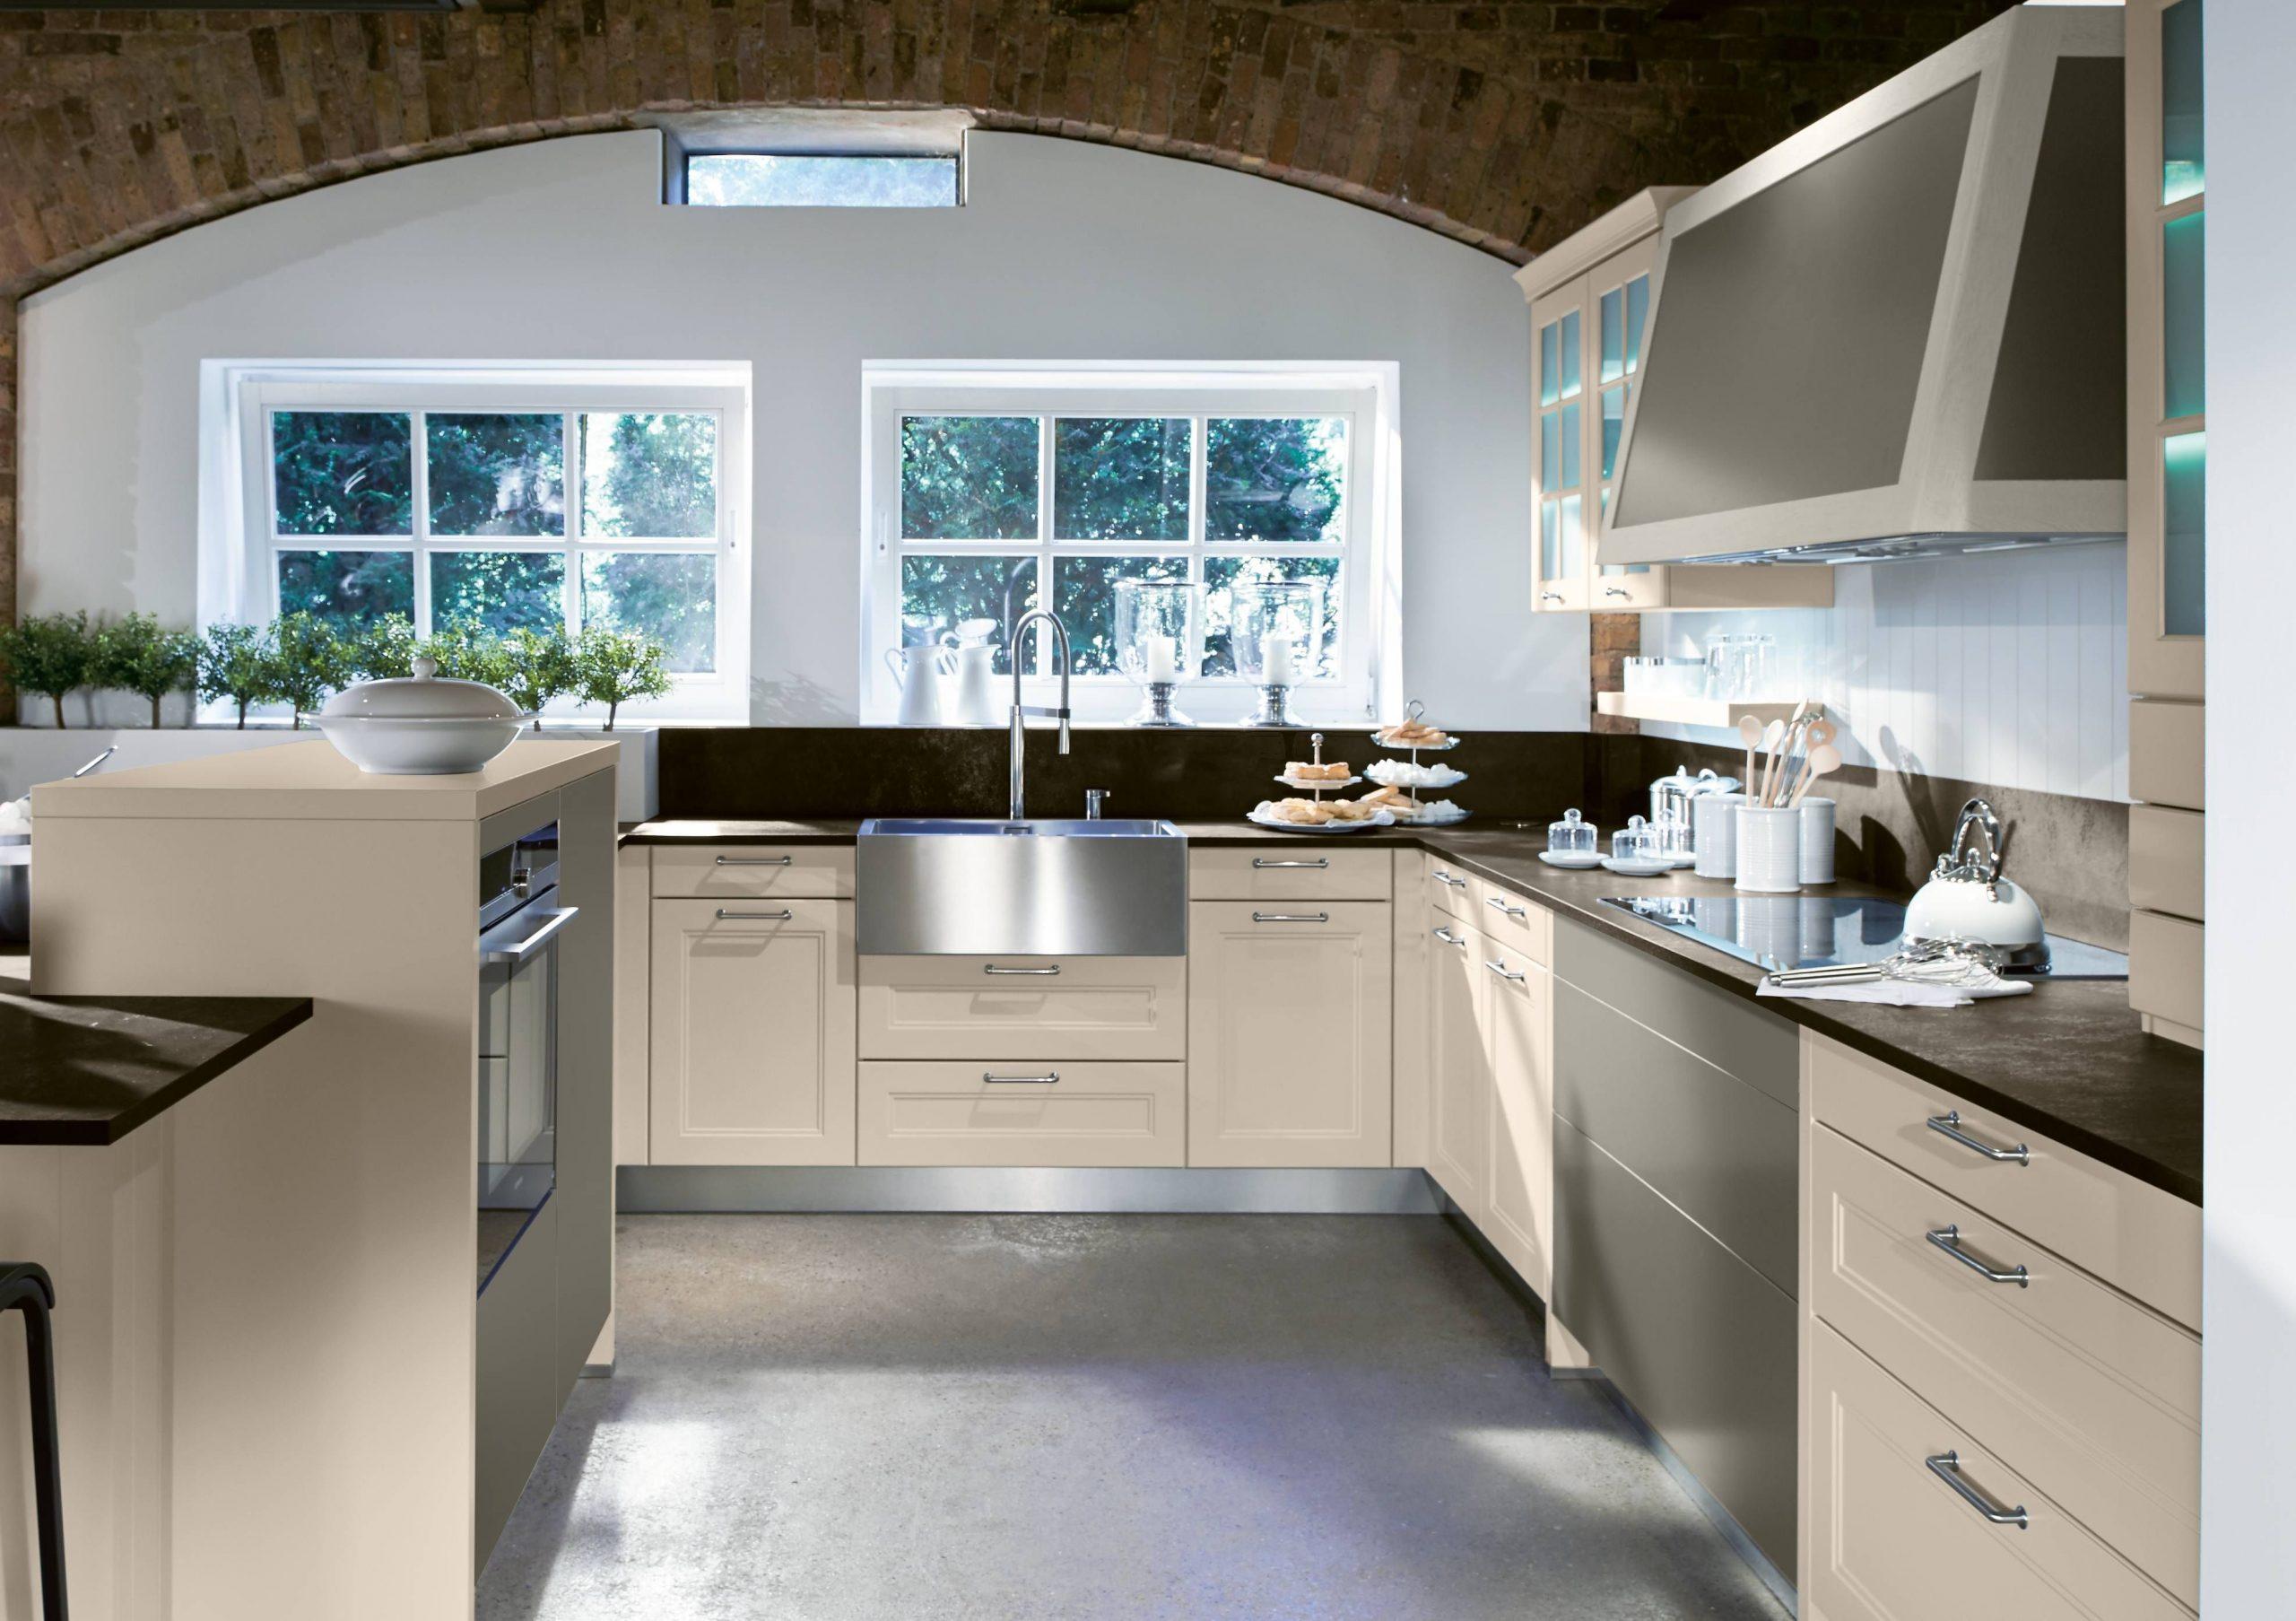 Full Size of Moderne Küche Ebay Moderne Küche Grau Moderne Küche Weiß Moderne Küche Gardinen 2019 Küche Moderne Landhausküche